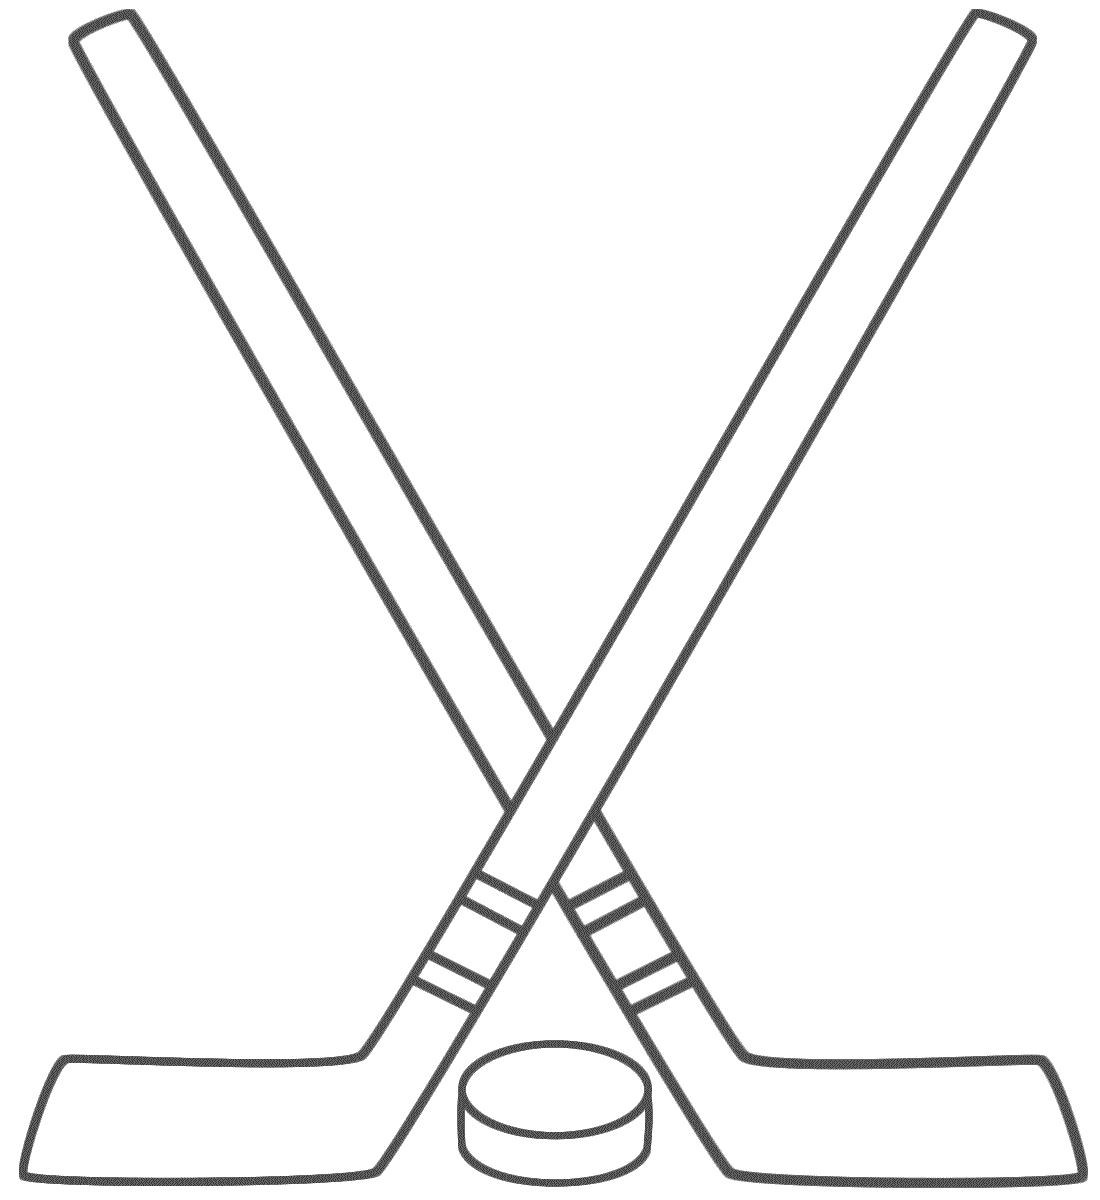 Hockey Stick Free Clipart - Clipart Kid